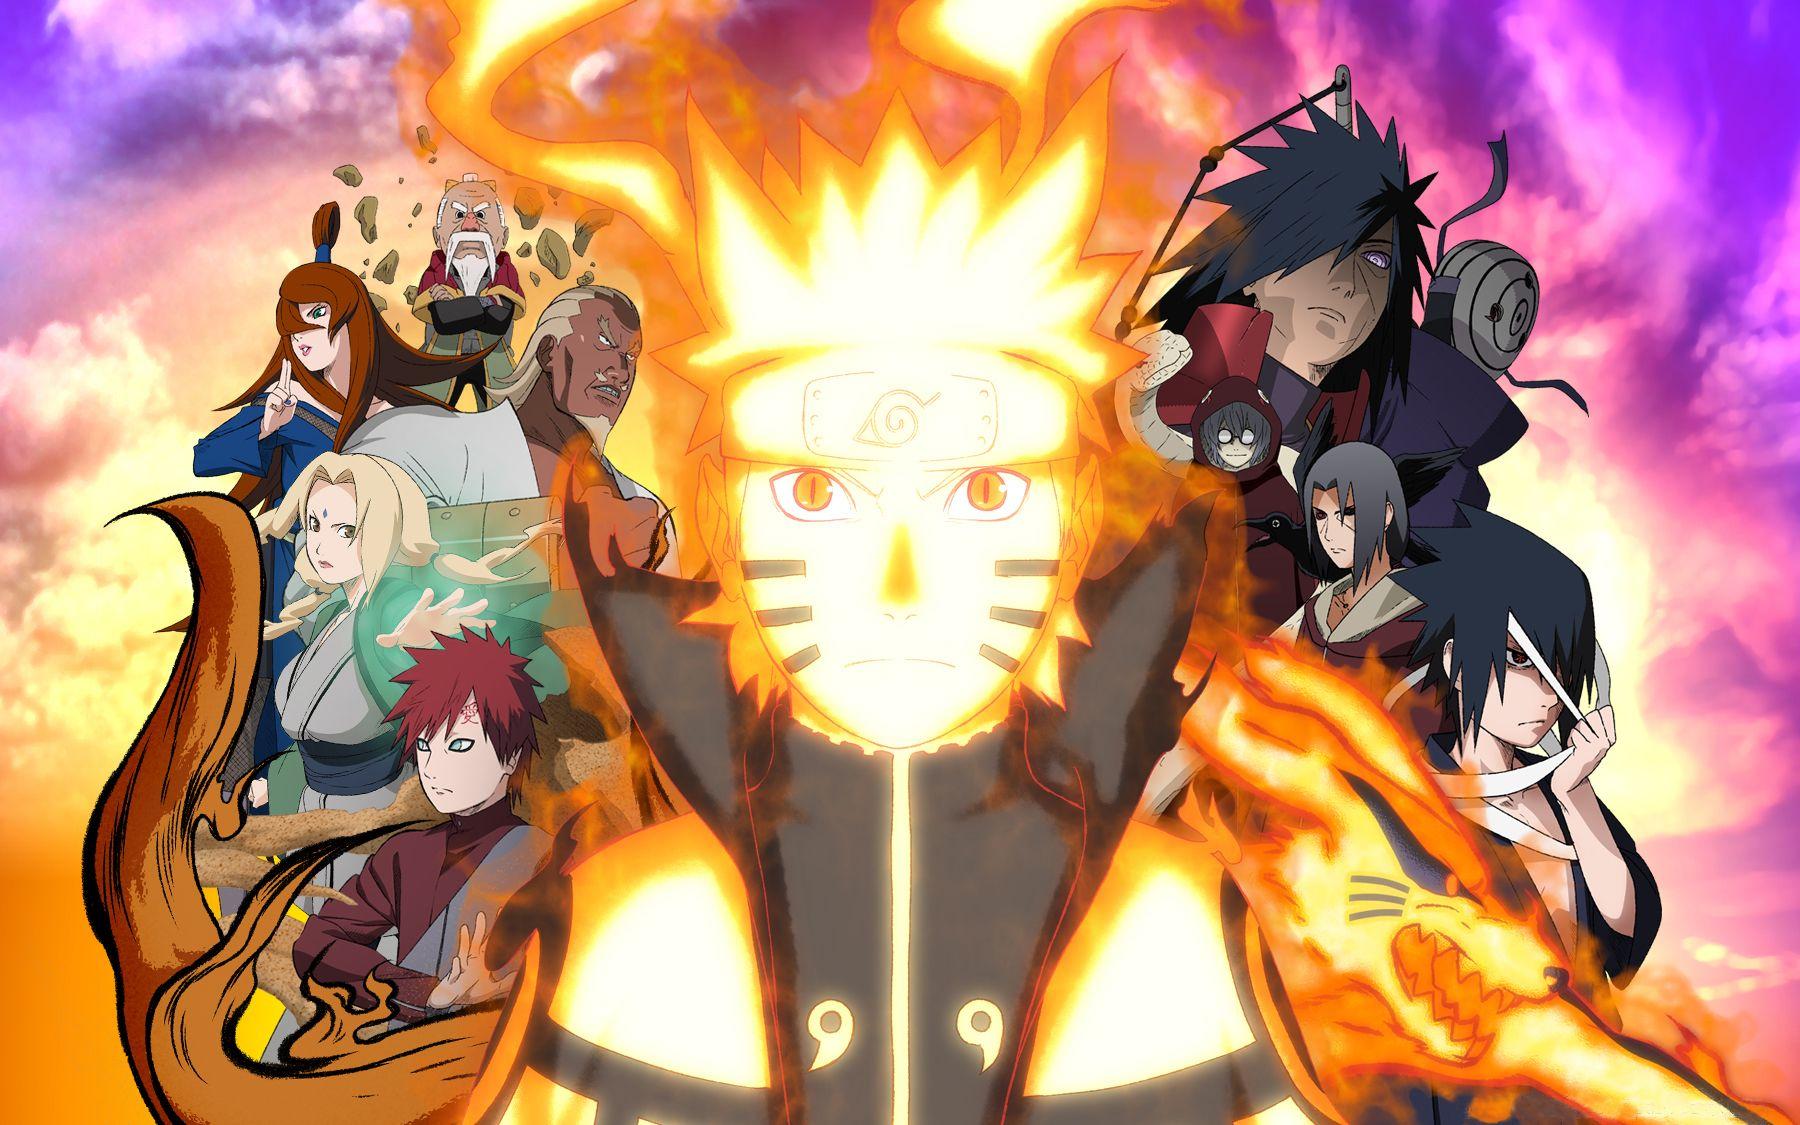 Naruto Shippuden Episode 425 Subtitle Indonesia Download